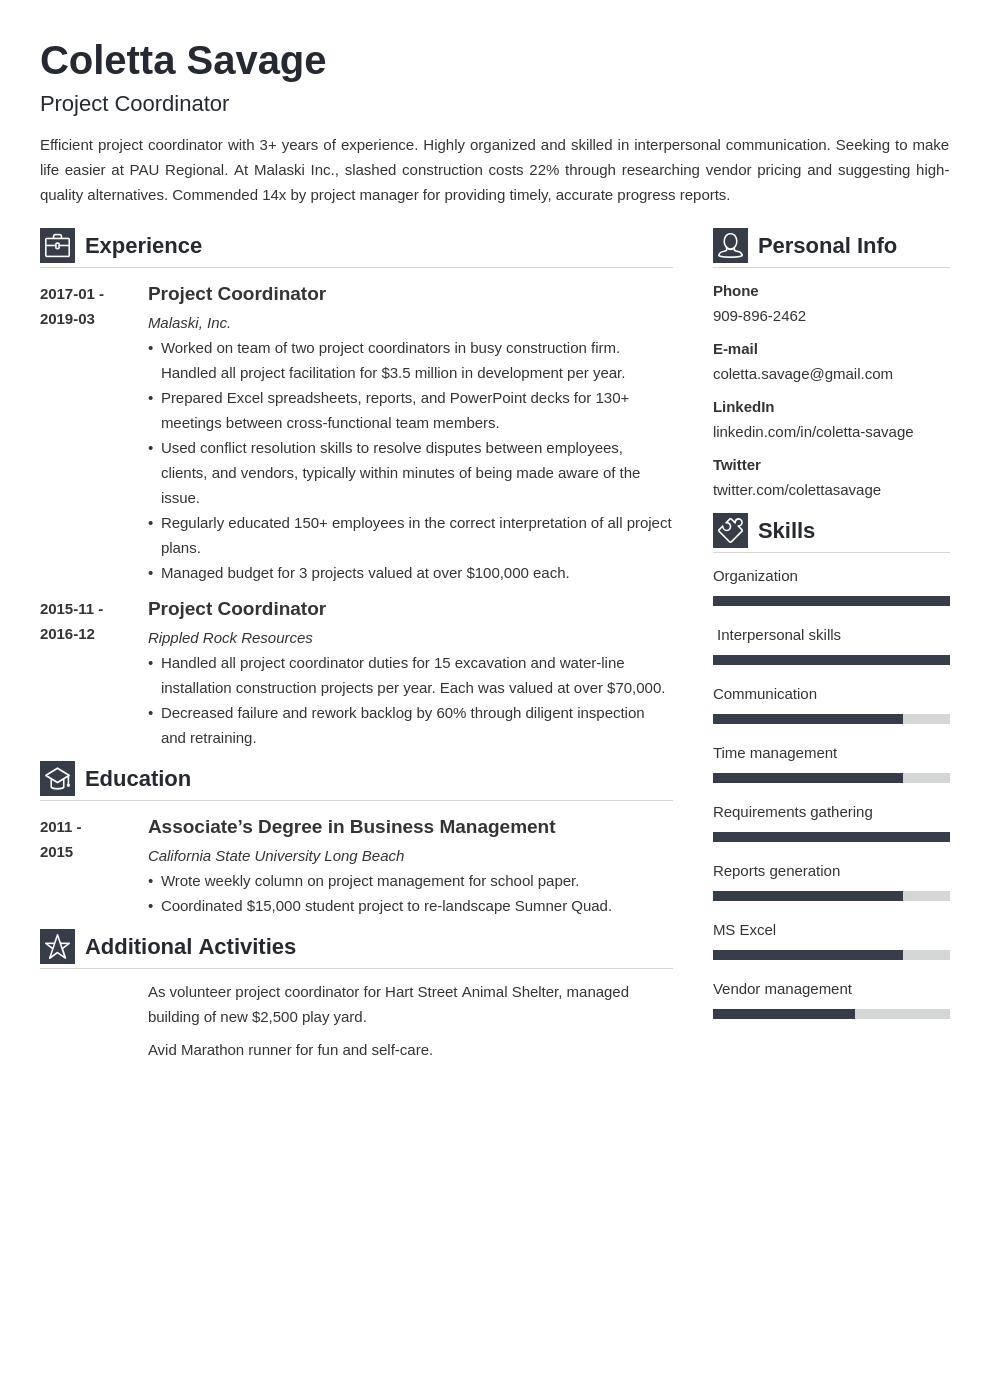 Project Coordinator Resume Example Template Vibes Resume Examples Job Resume Examples Resume